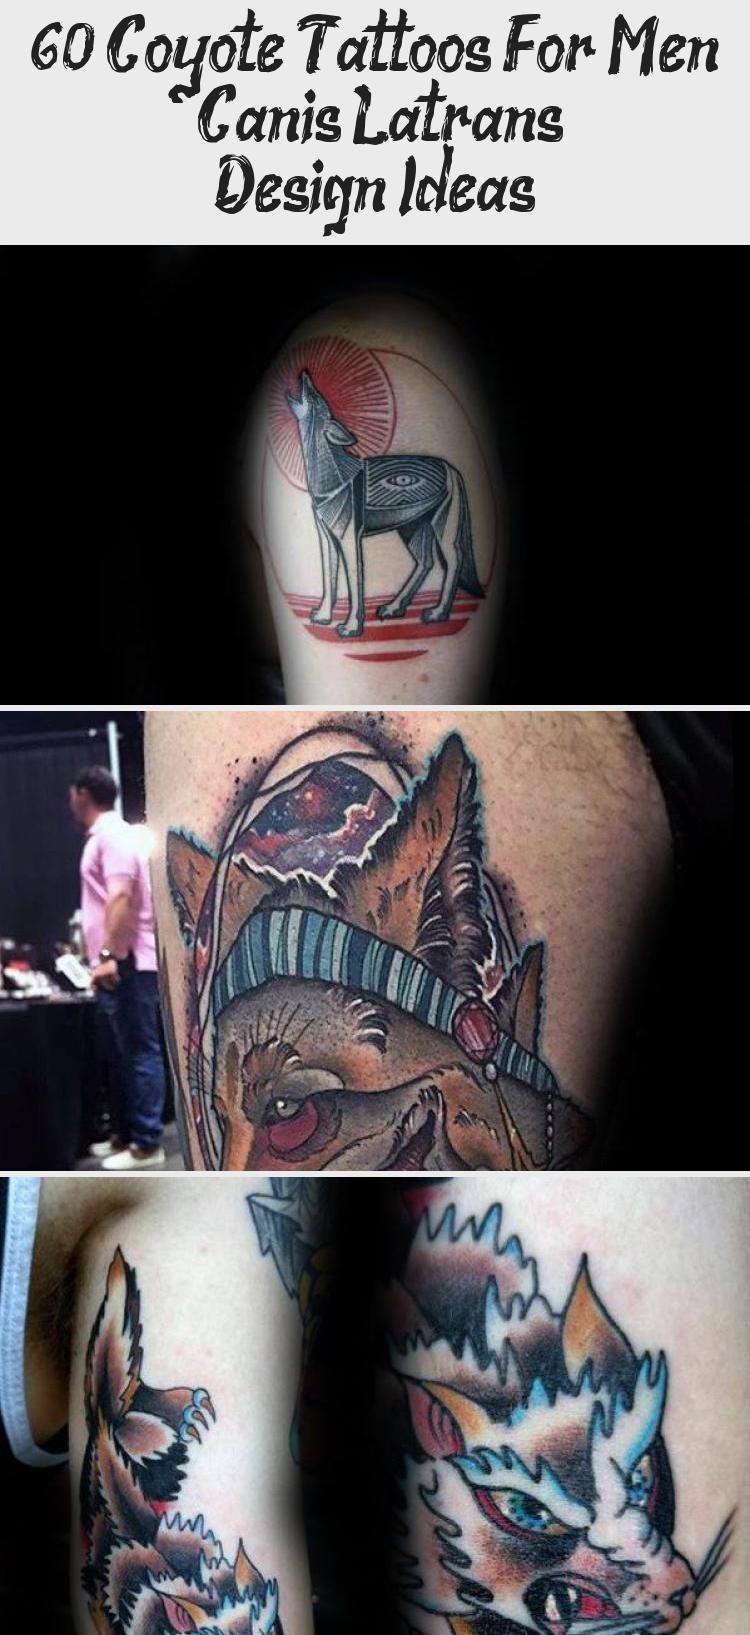 60 Coyote Tattoos For Men  Canis Latrans Design Ideas  Best Tattoos  60 Coyote Tattoos For Men  Canis Latrans Design Ideas